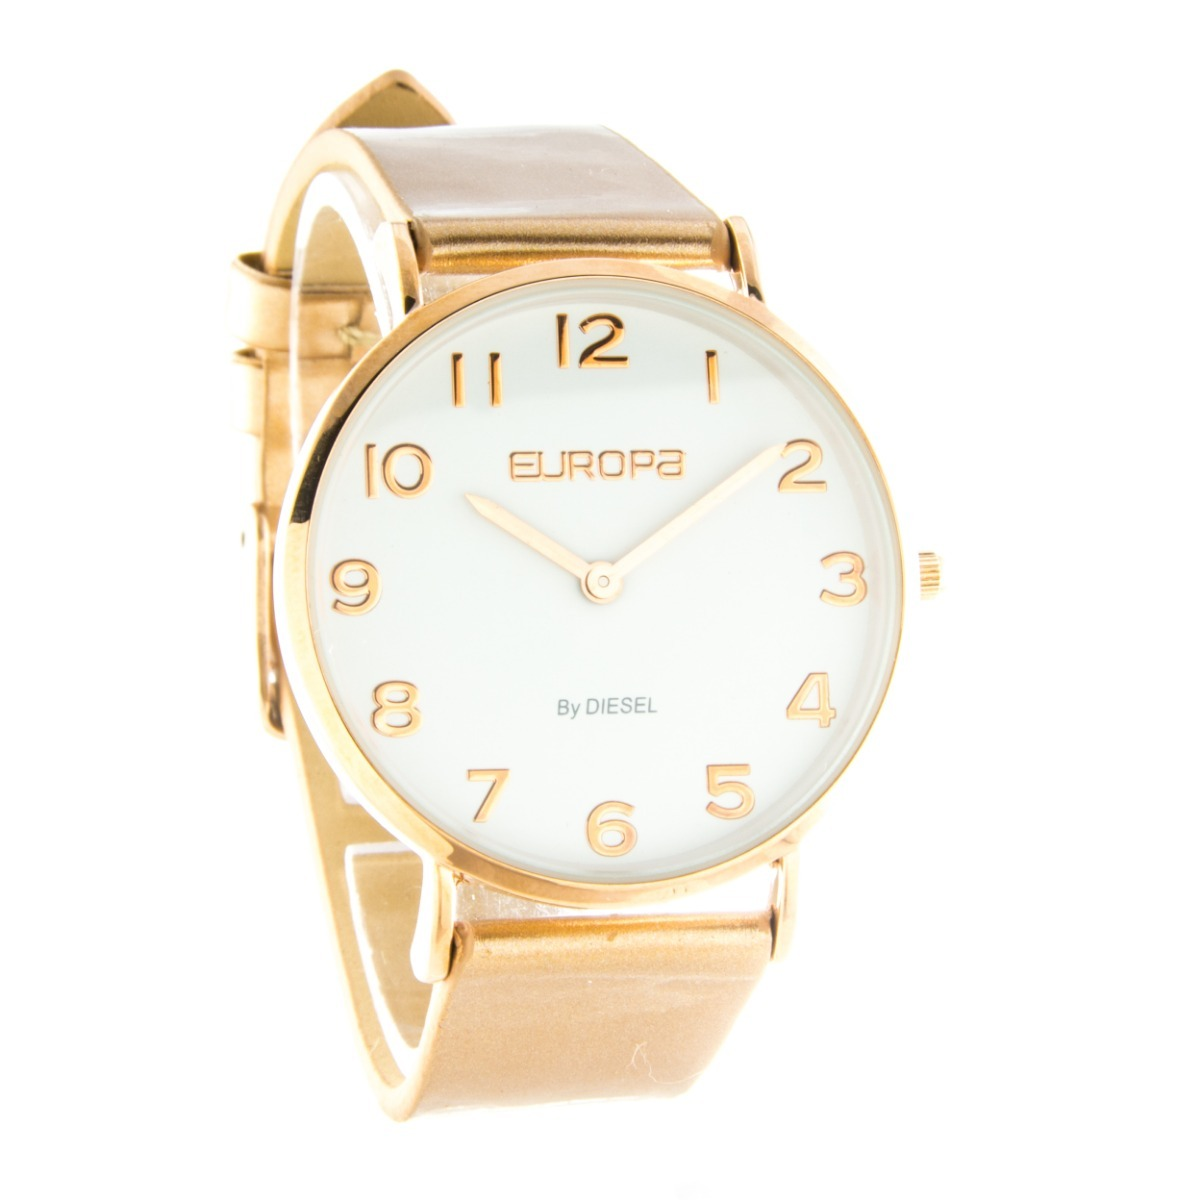 49cebf4e7195 reloj europa by diesel mujer rose cuero mod 4000. balum 01. Cargando zoom.